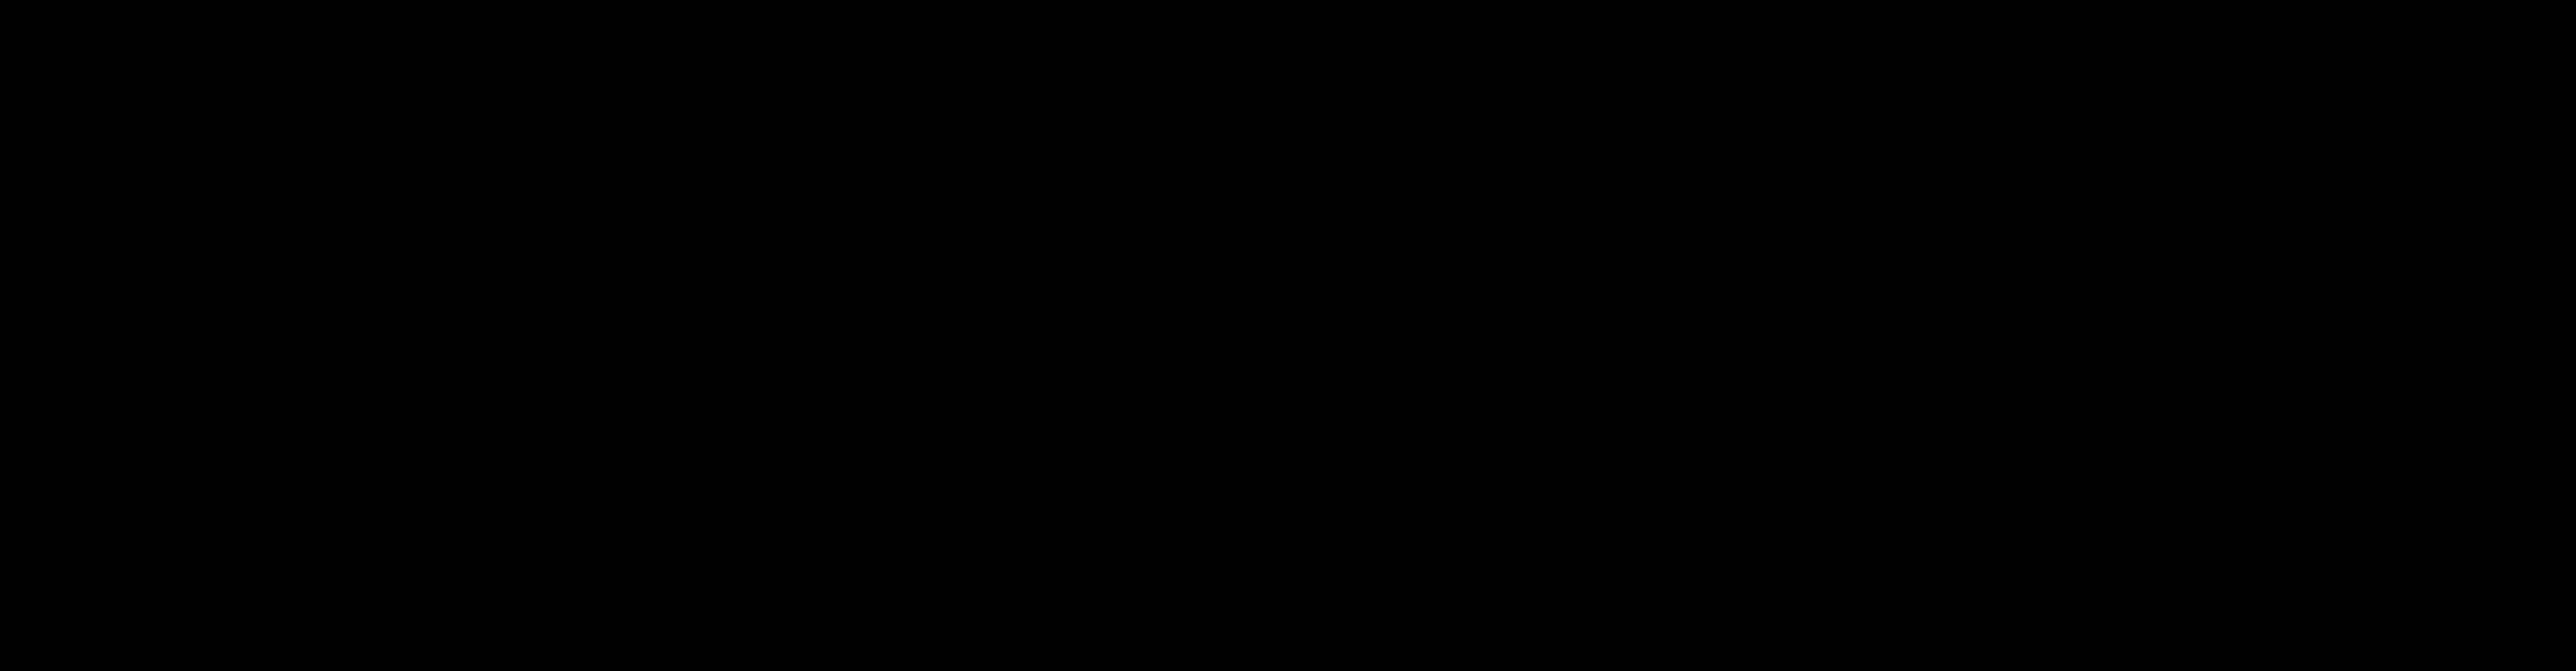 elemed_logo2